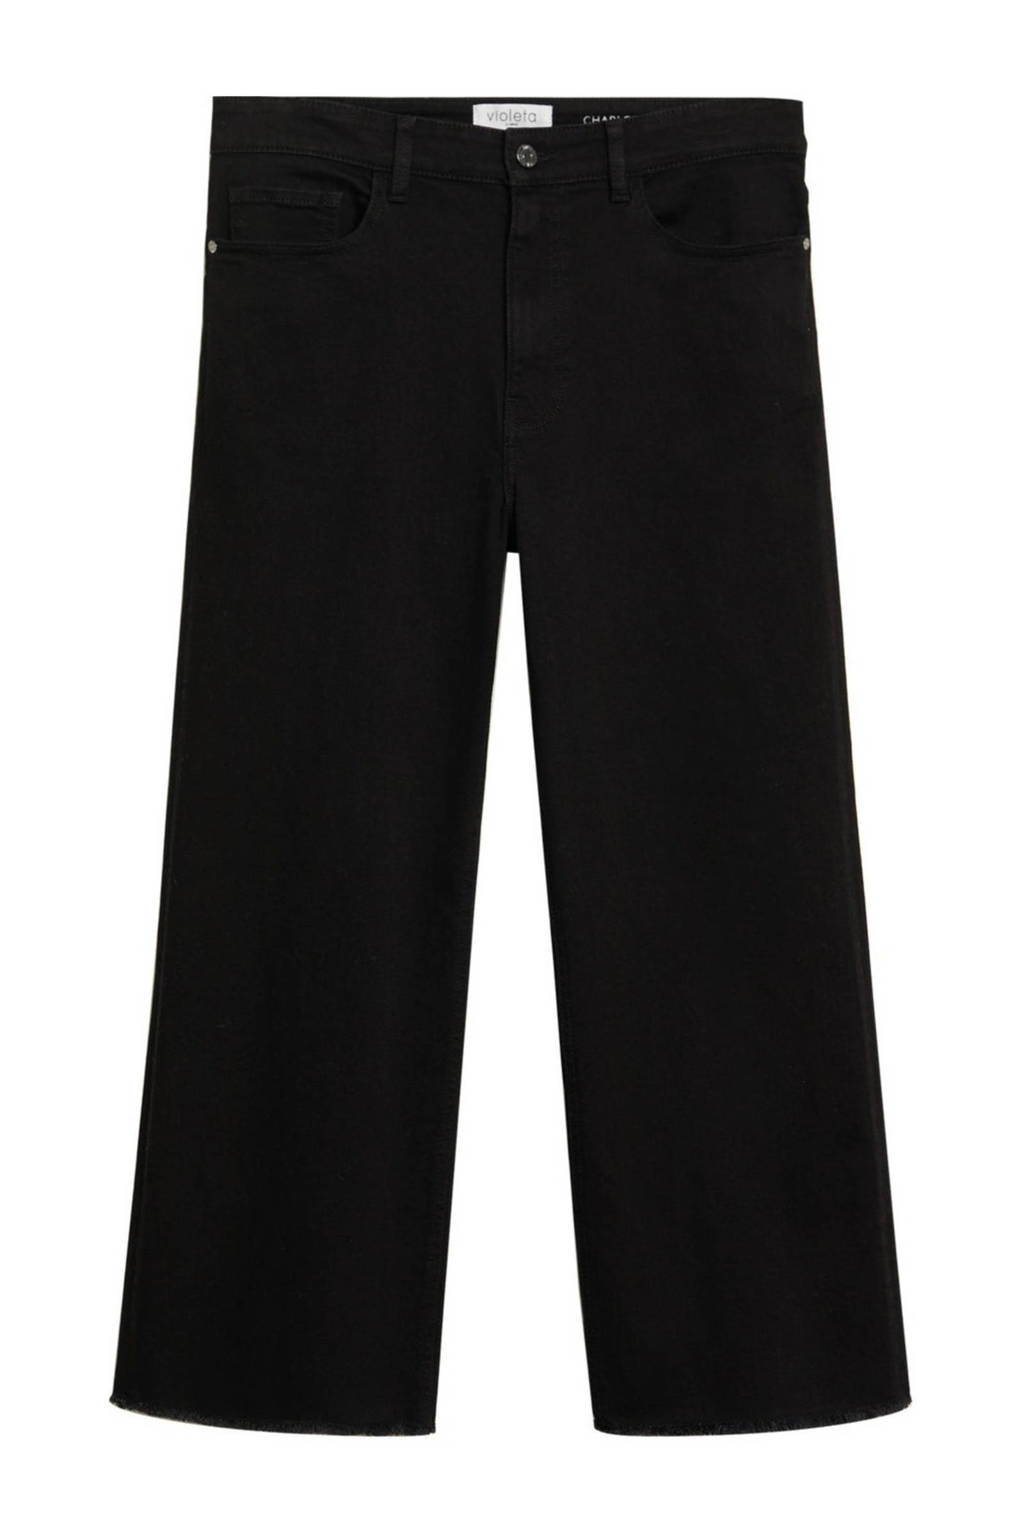 Violeta by Mango bootcut jeans zwart/donkergrijs, Zwart/donkergrijs